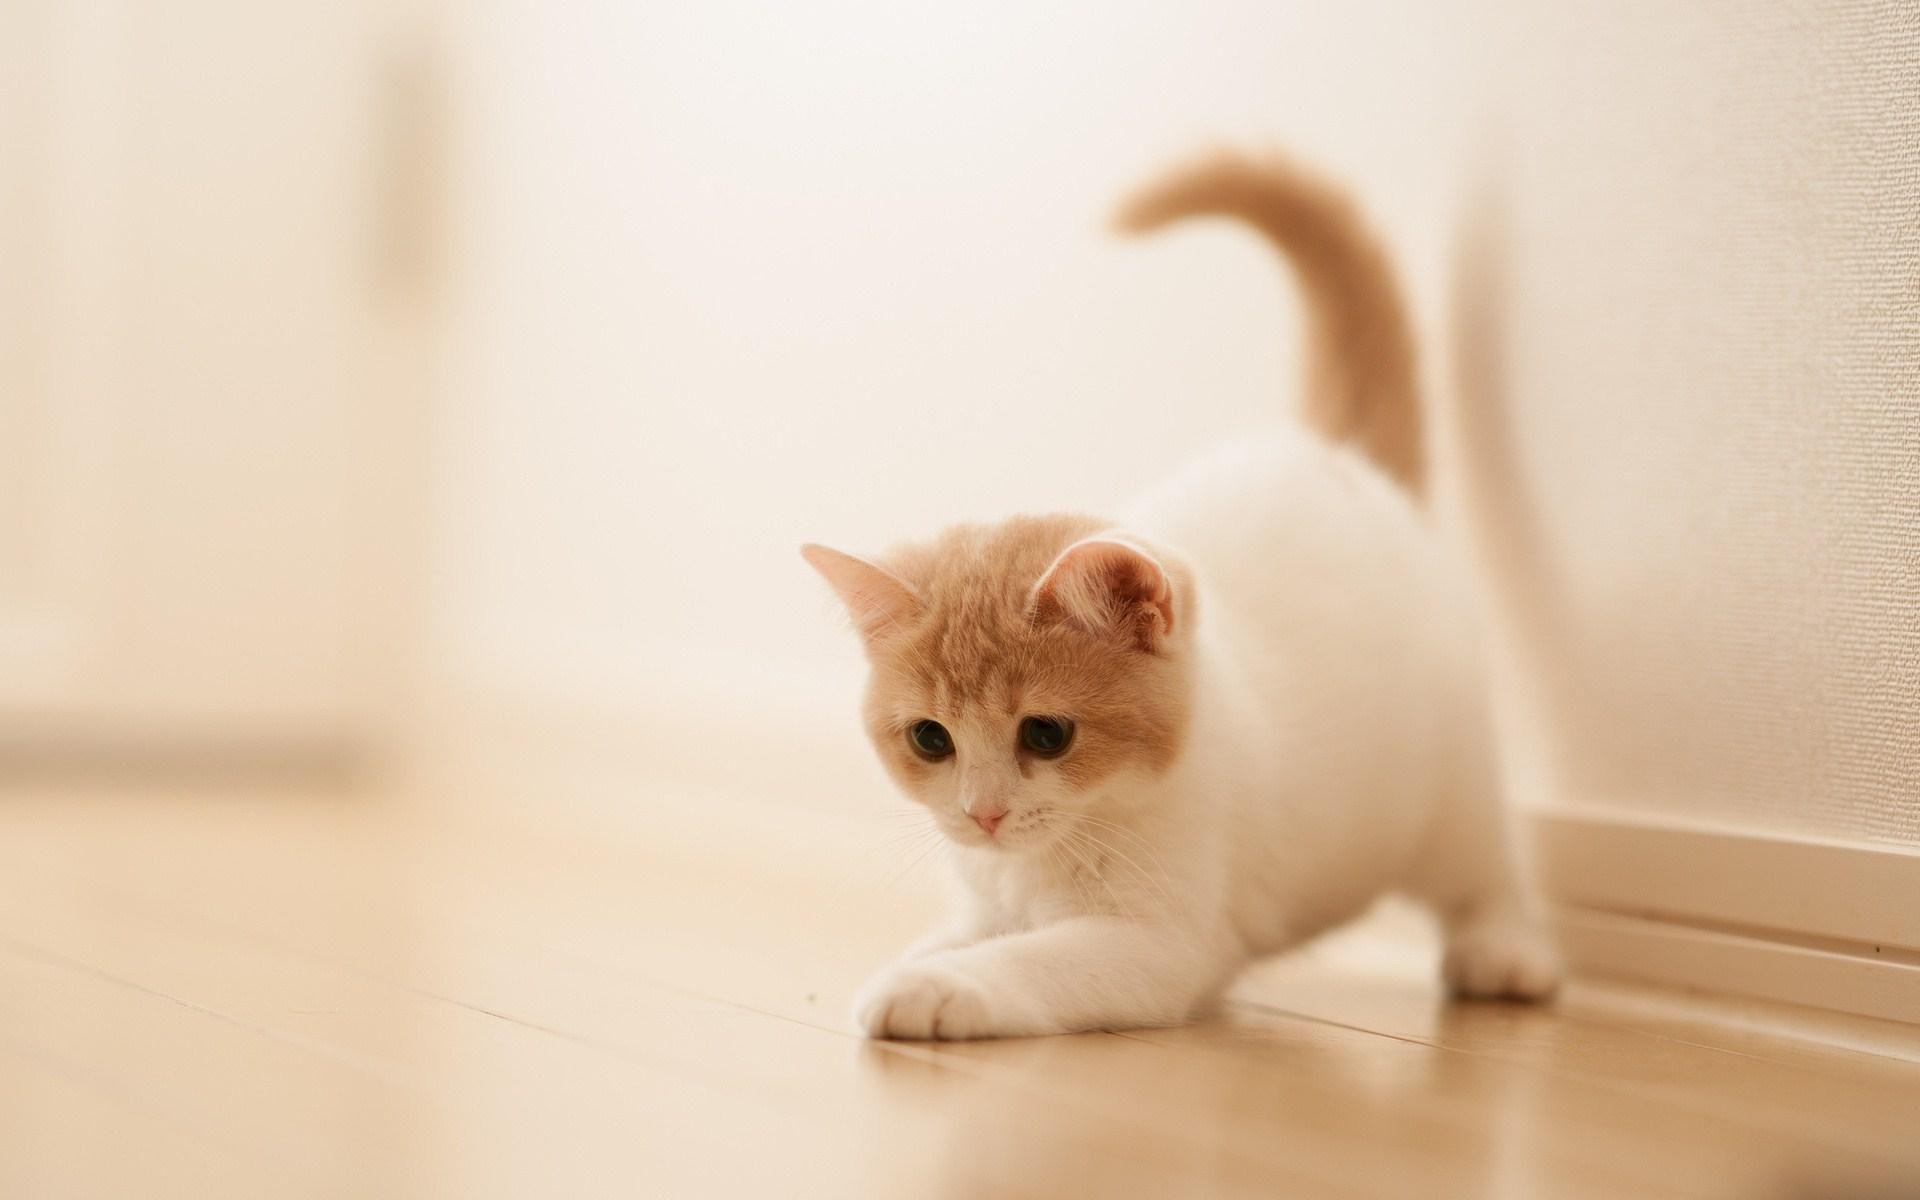 my cute kitten playing imgur